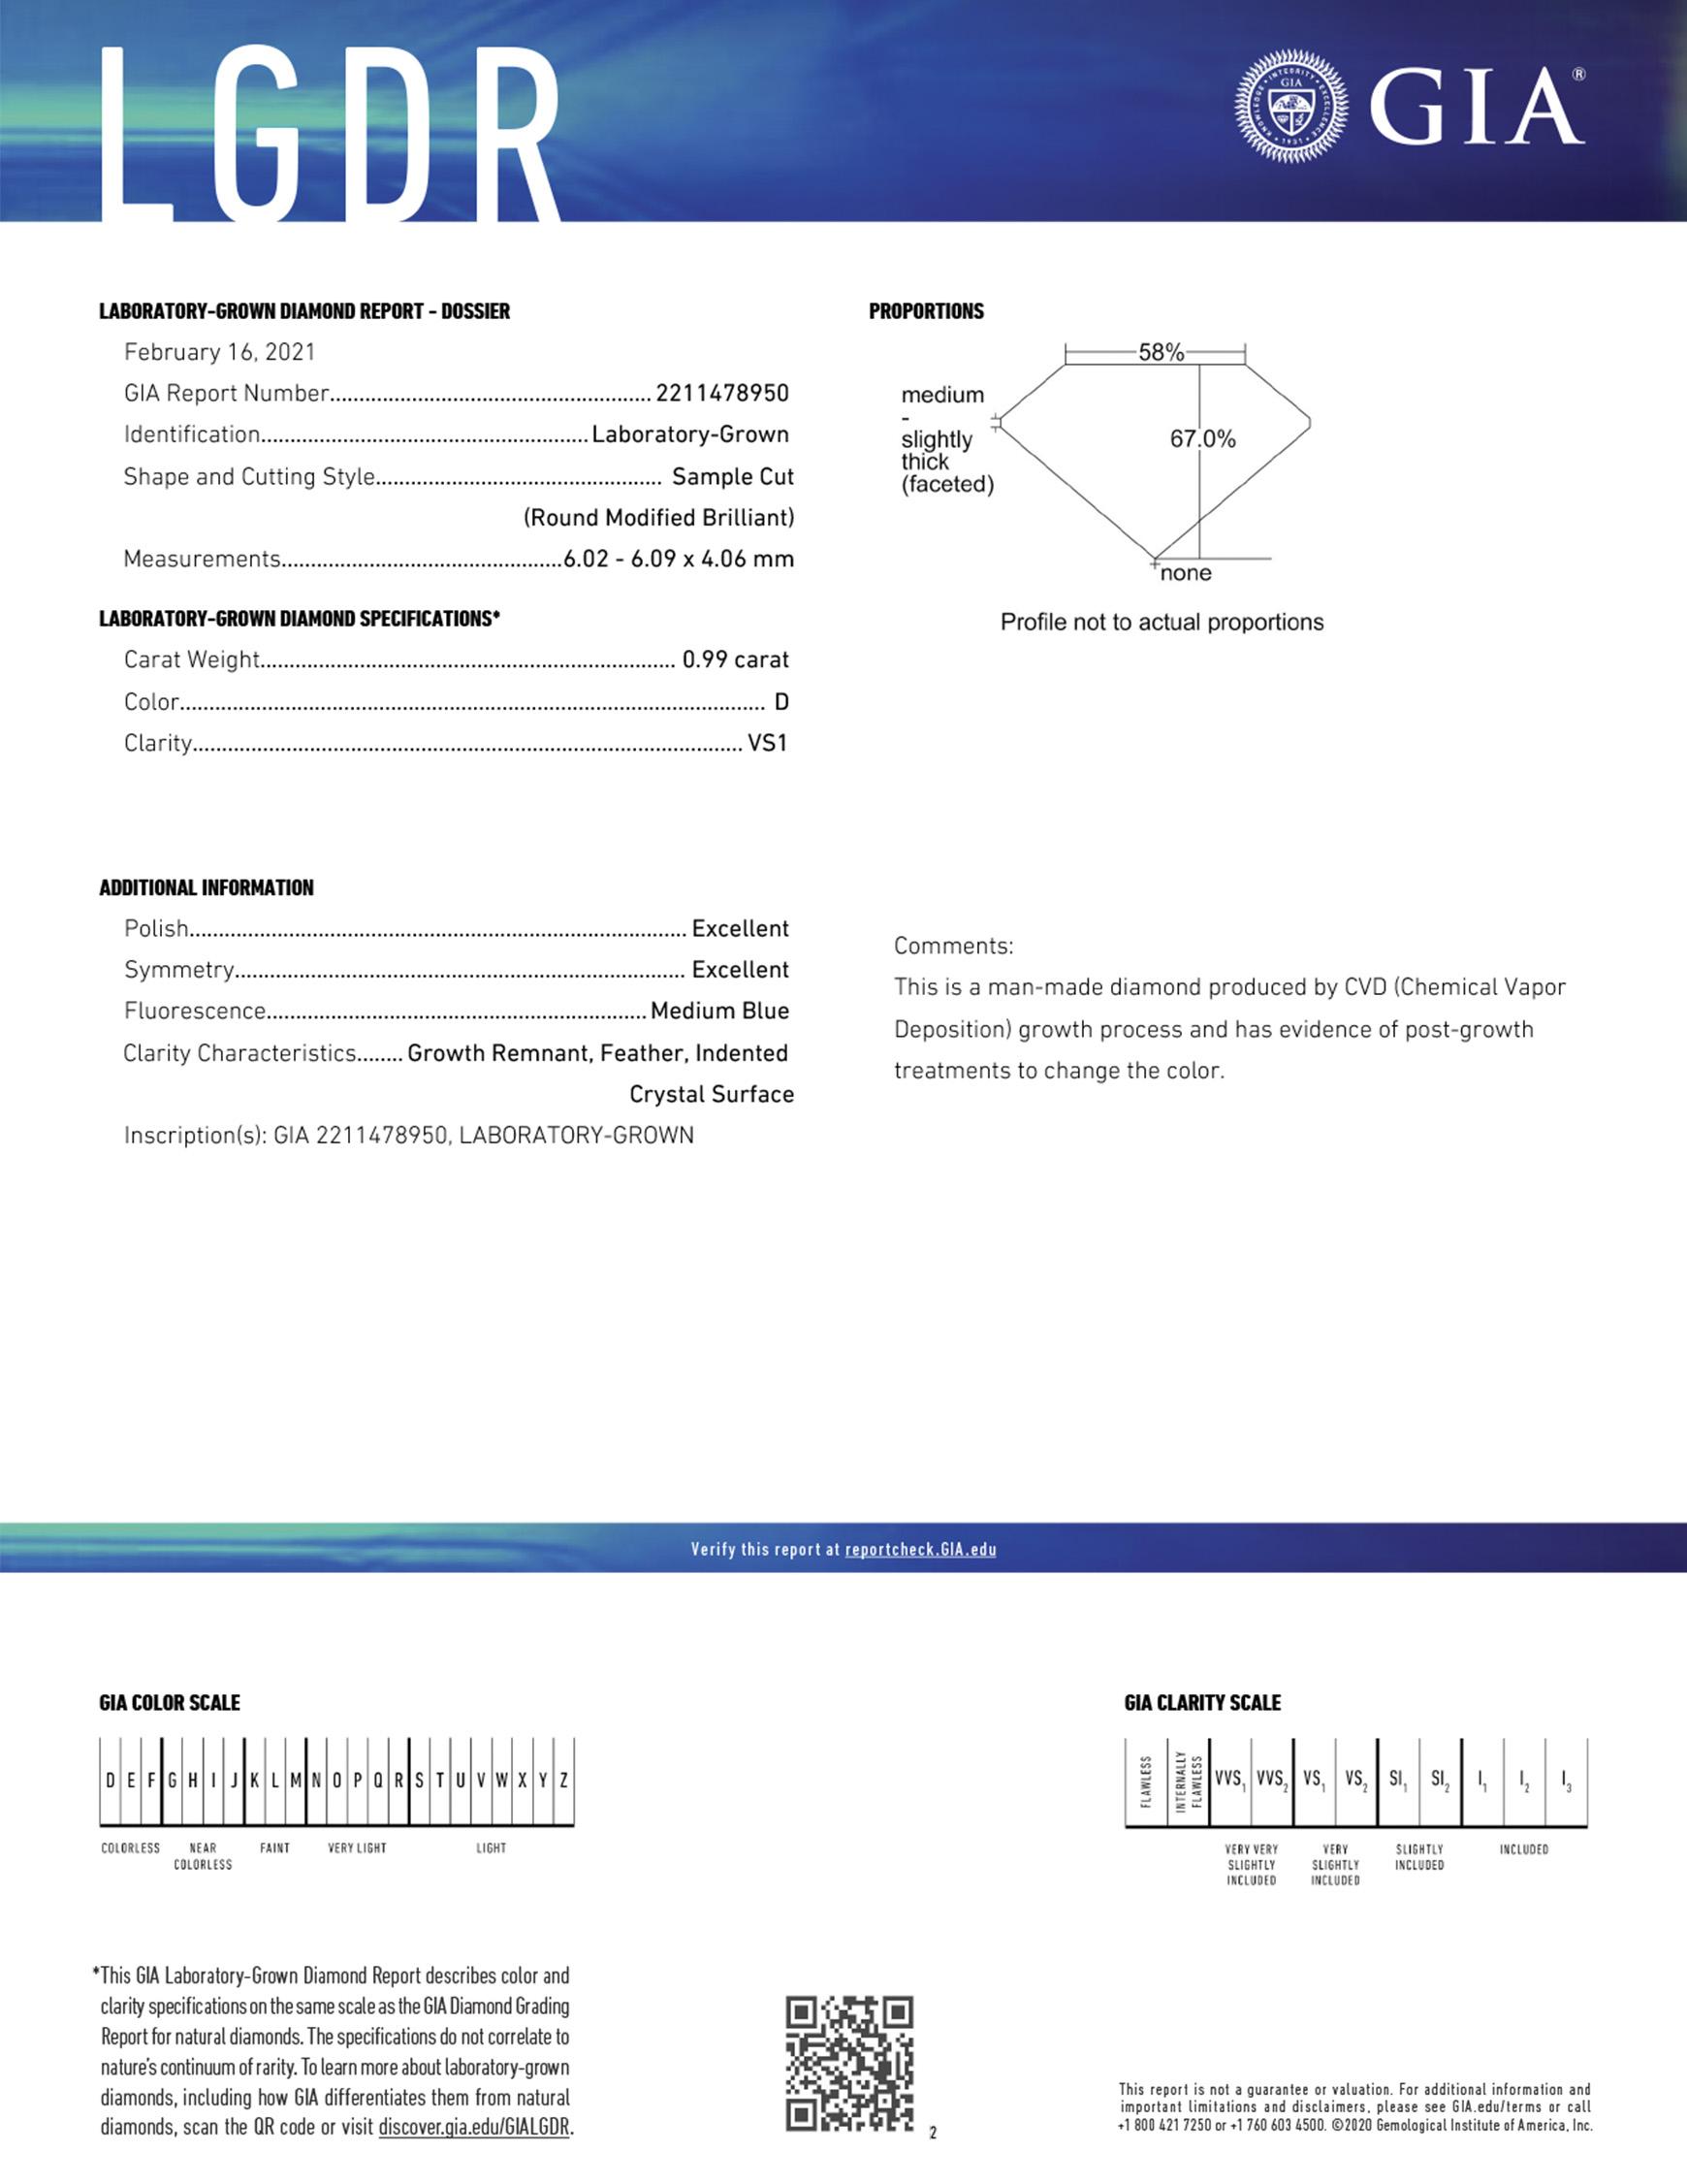 Sample Laboratory-Grown Diamond Report Dossier